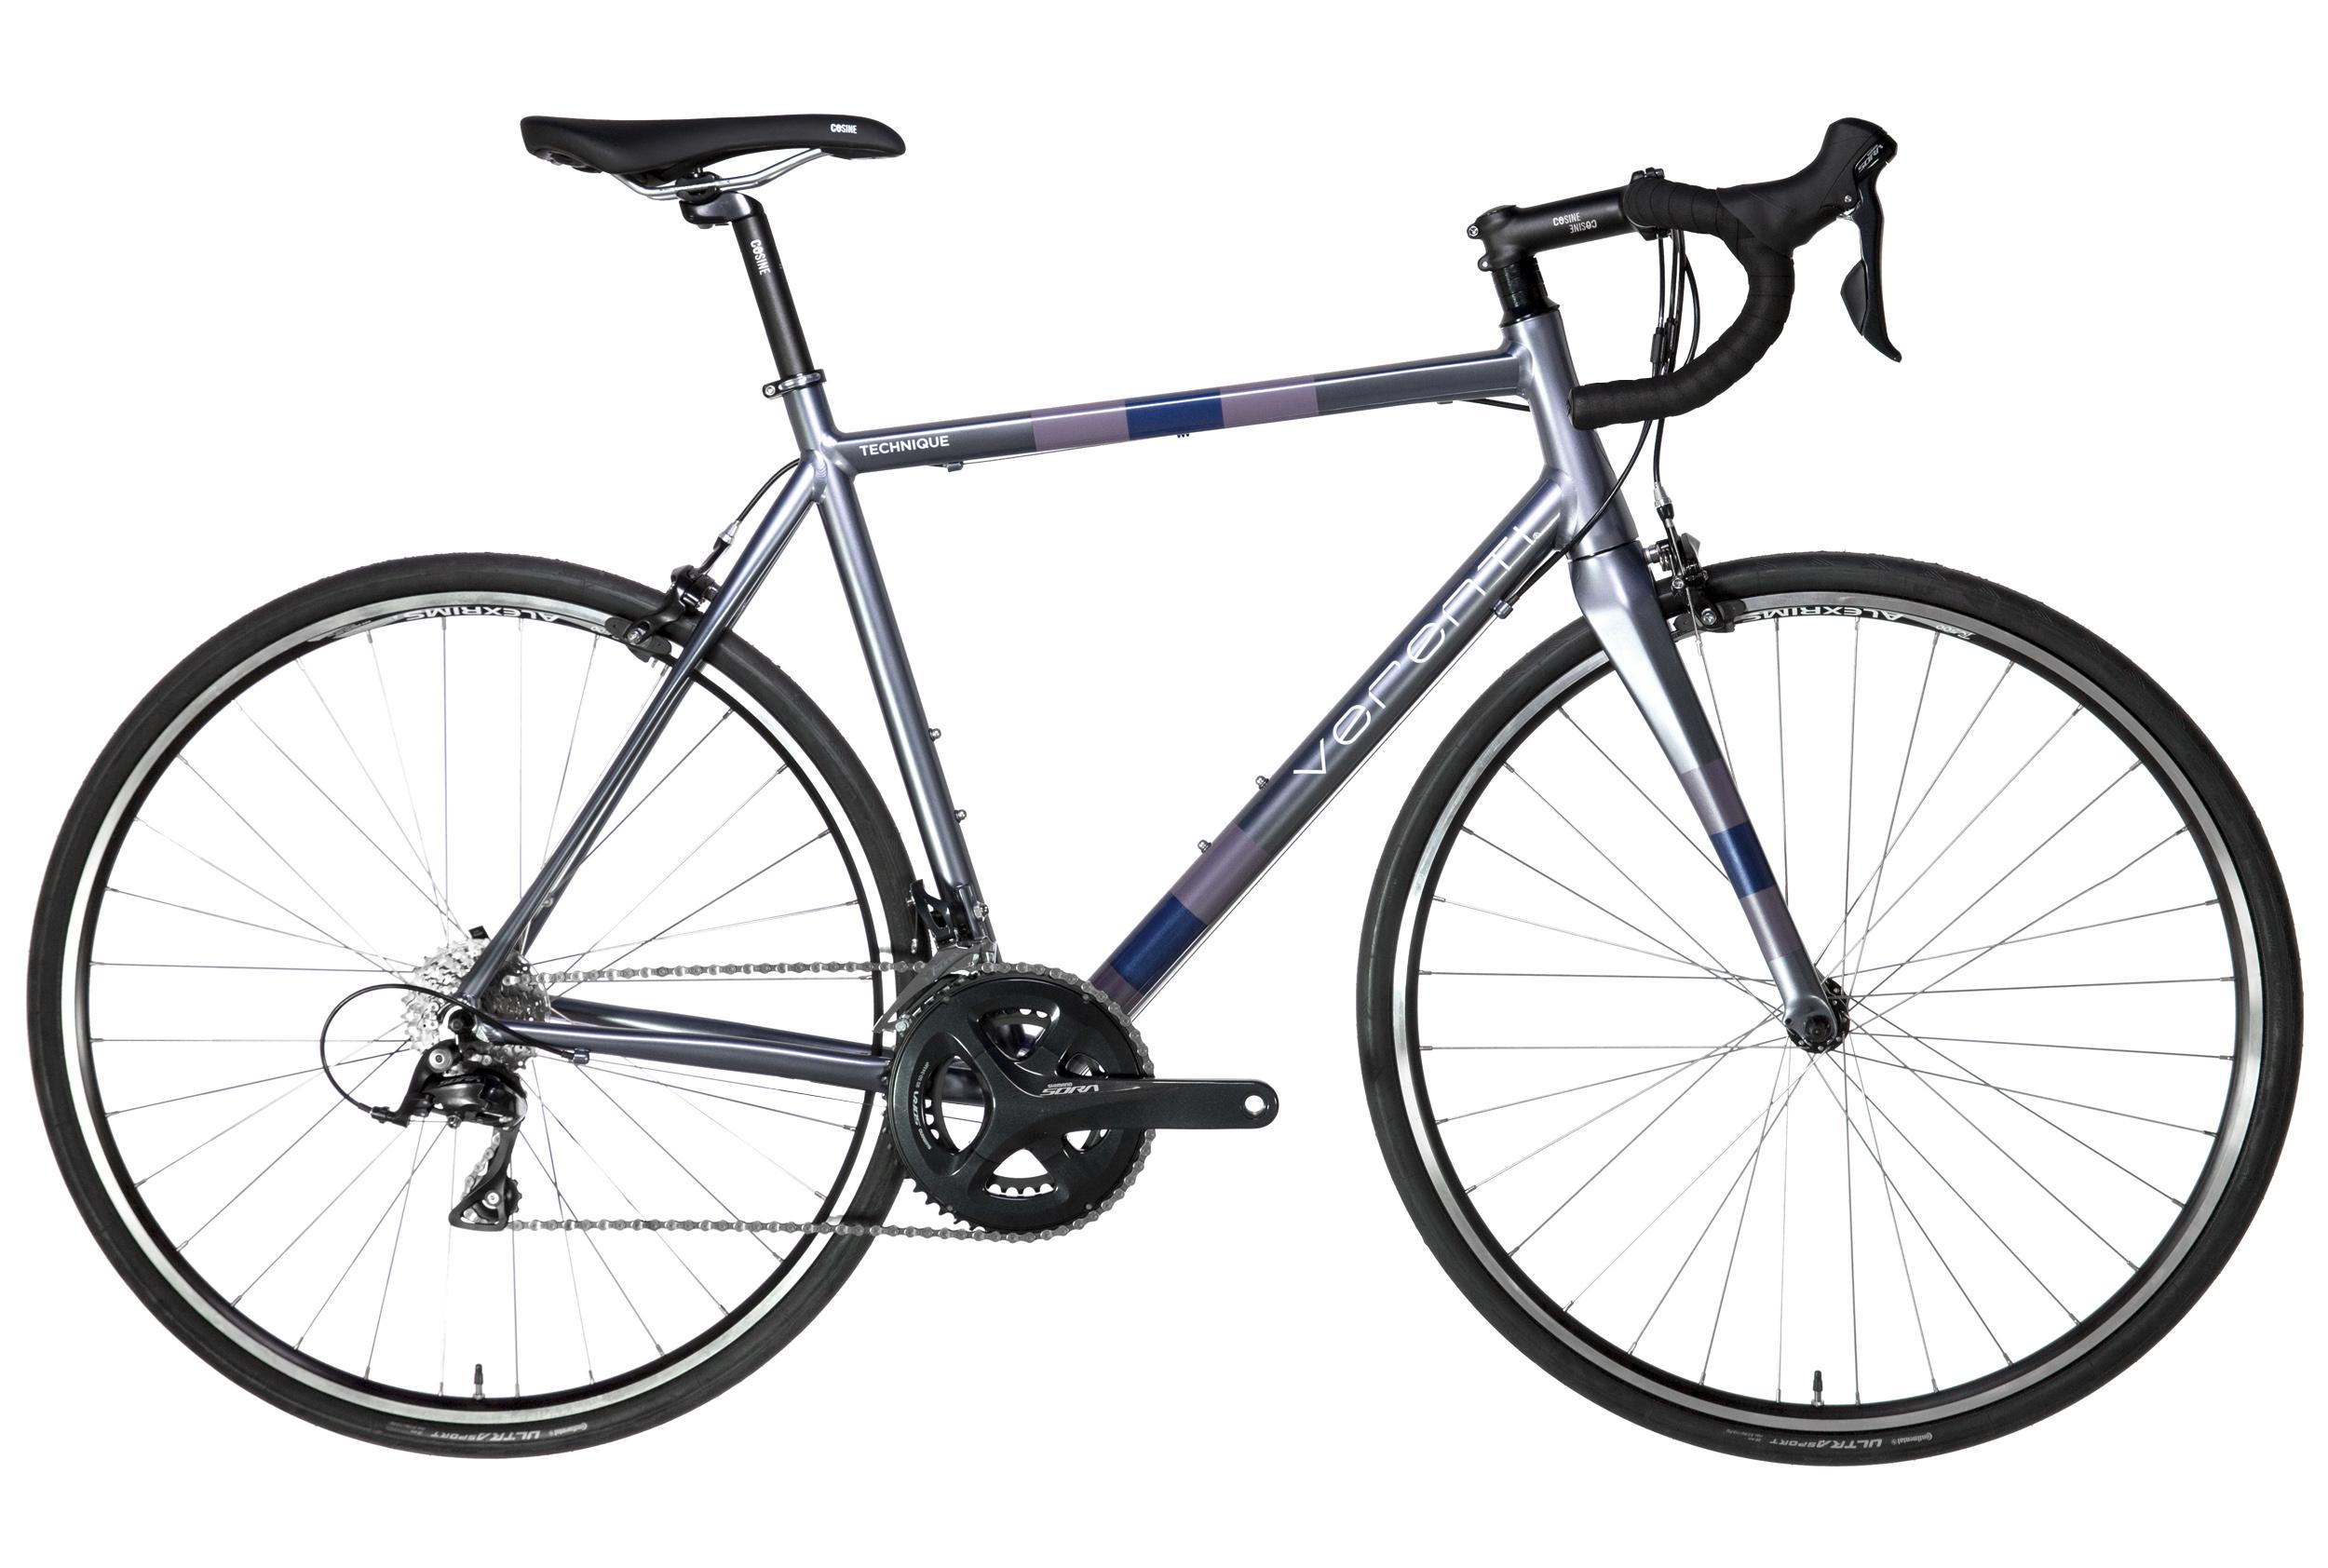 2500x1684 Wiggle Verenti Technique Sora (2017) Road Bike Road Bikes